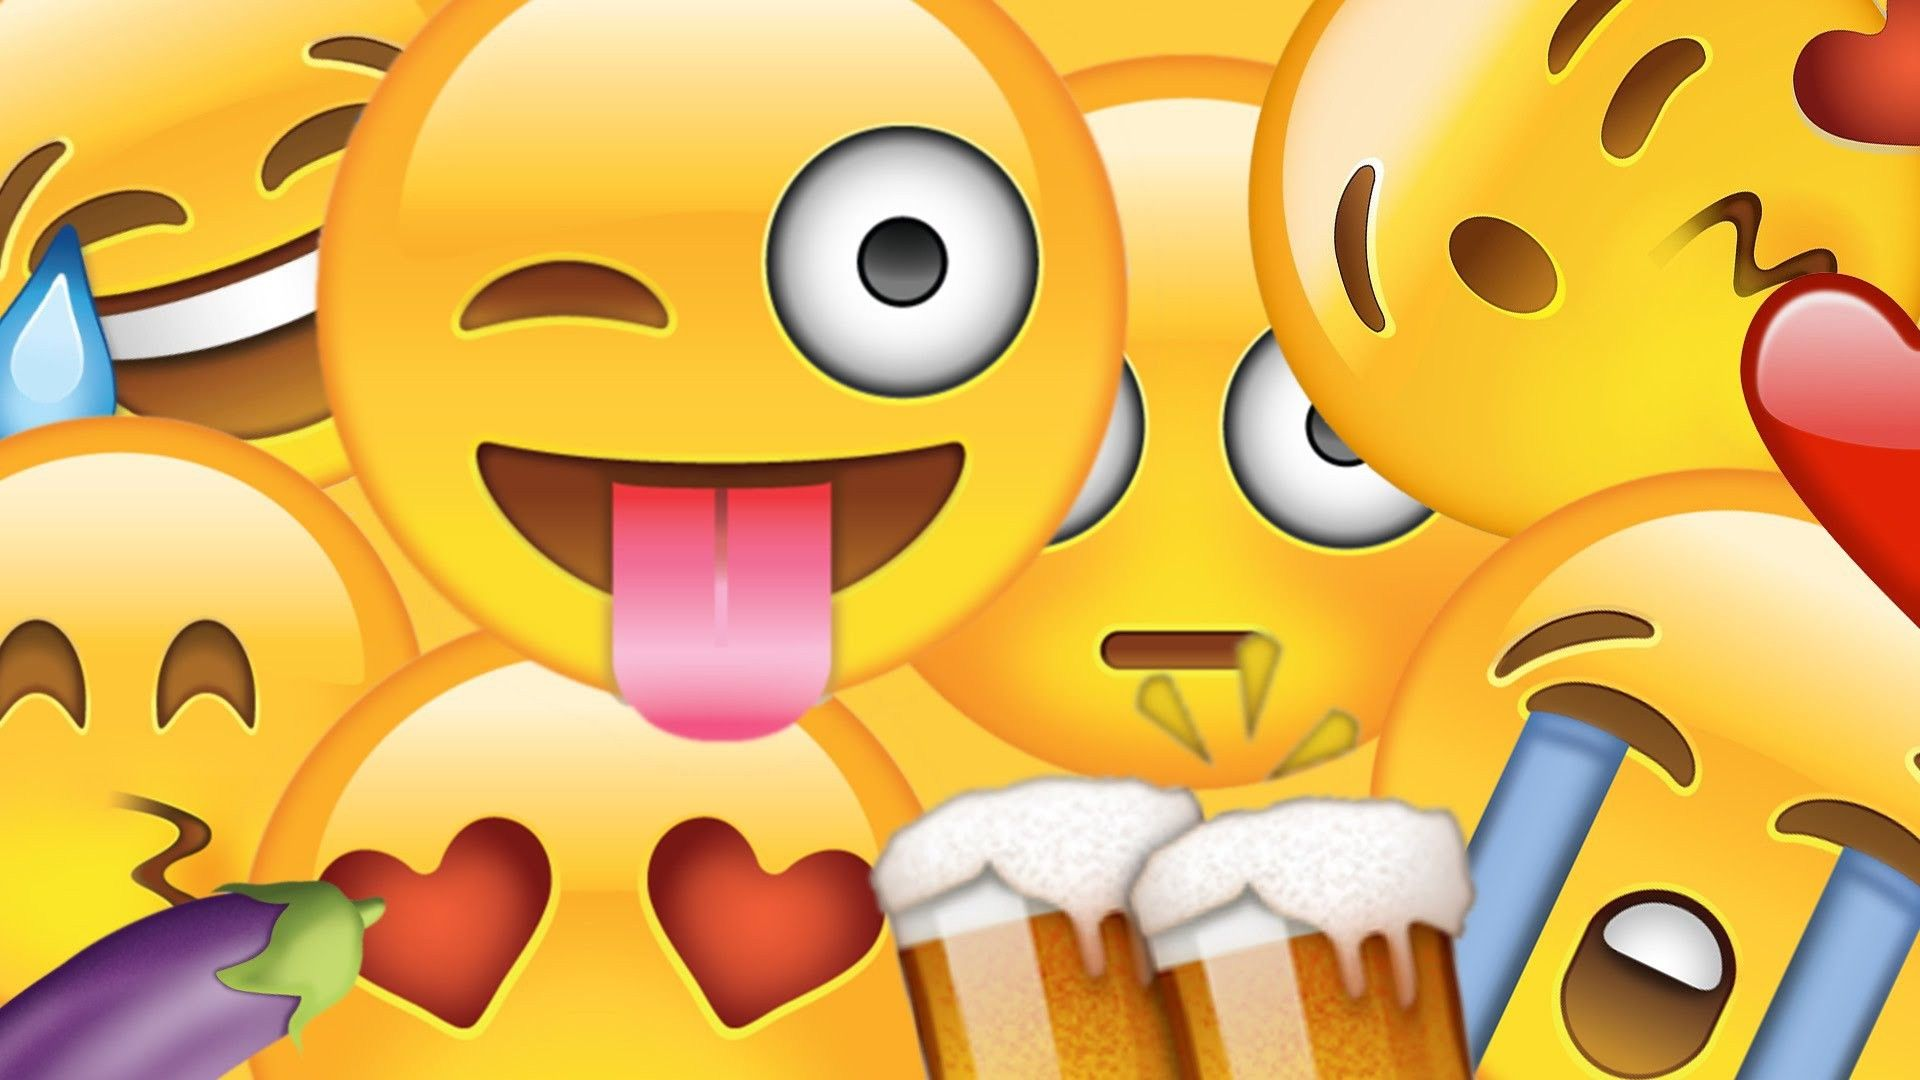 Emoji Desktop Wallpapers Top Free Emoji Desktop Backgrounds Wallpaperaccess